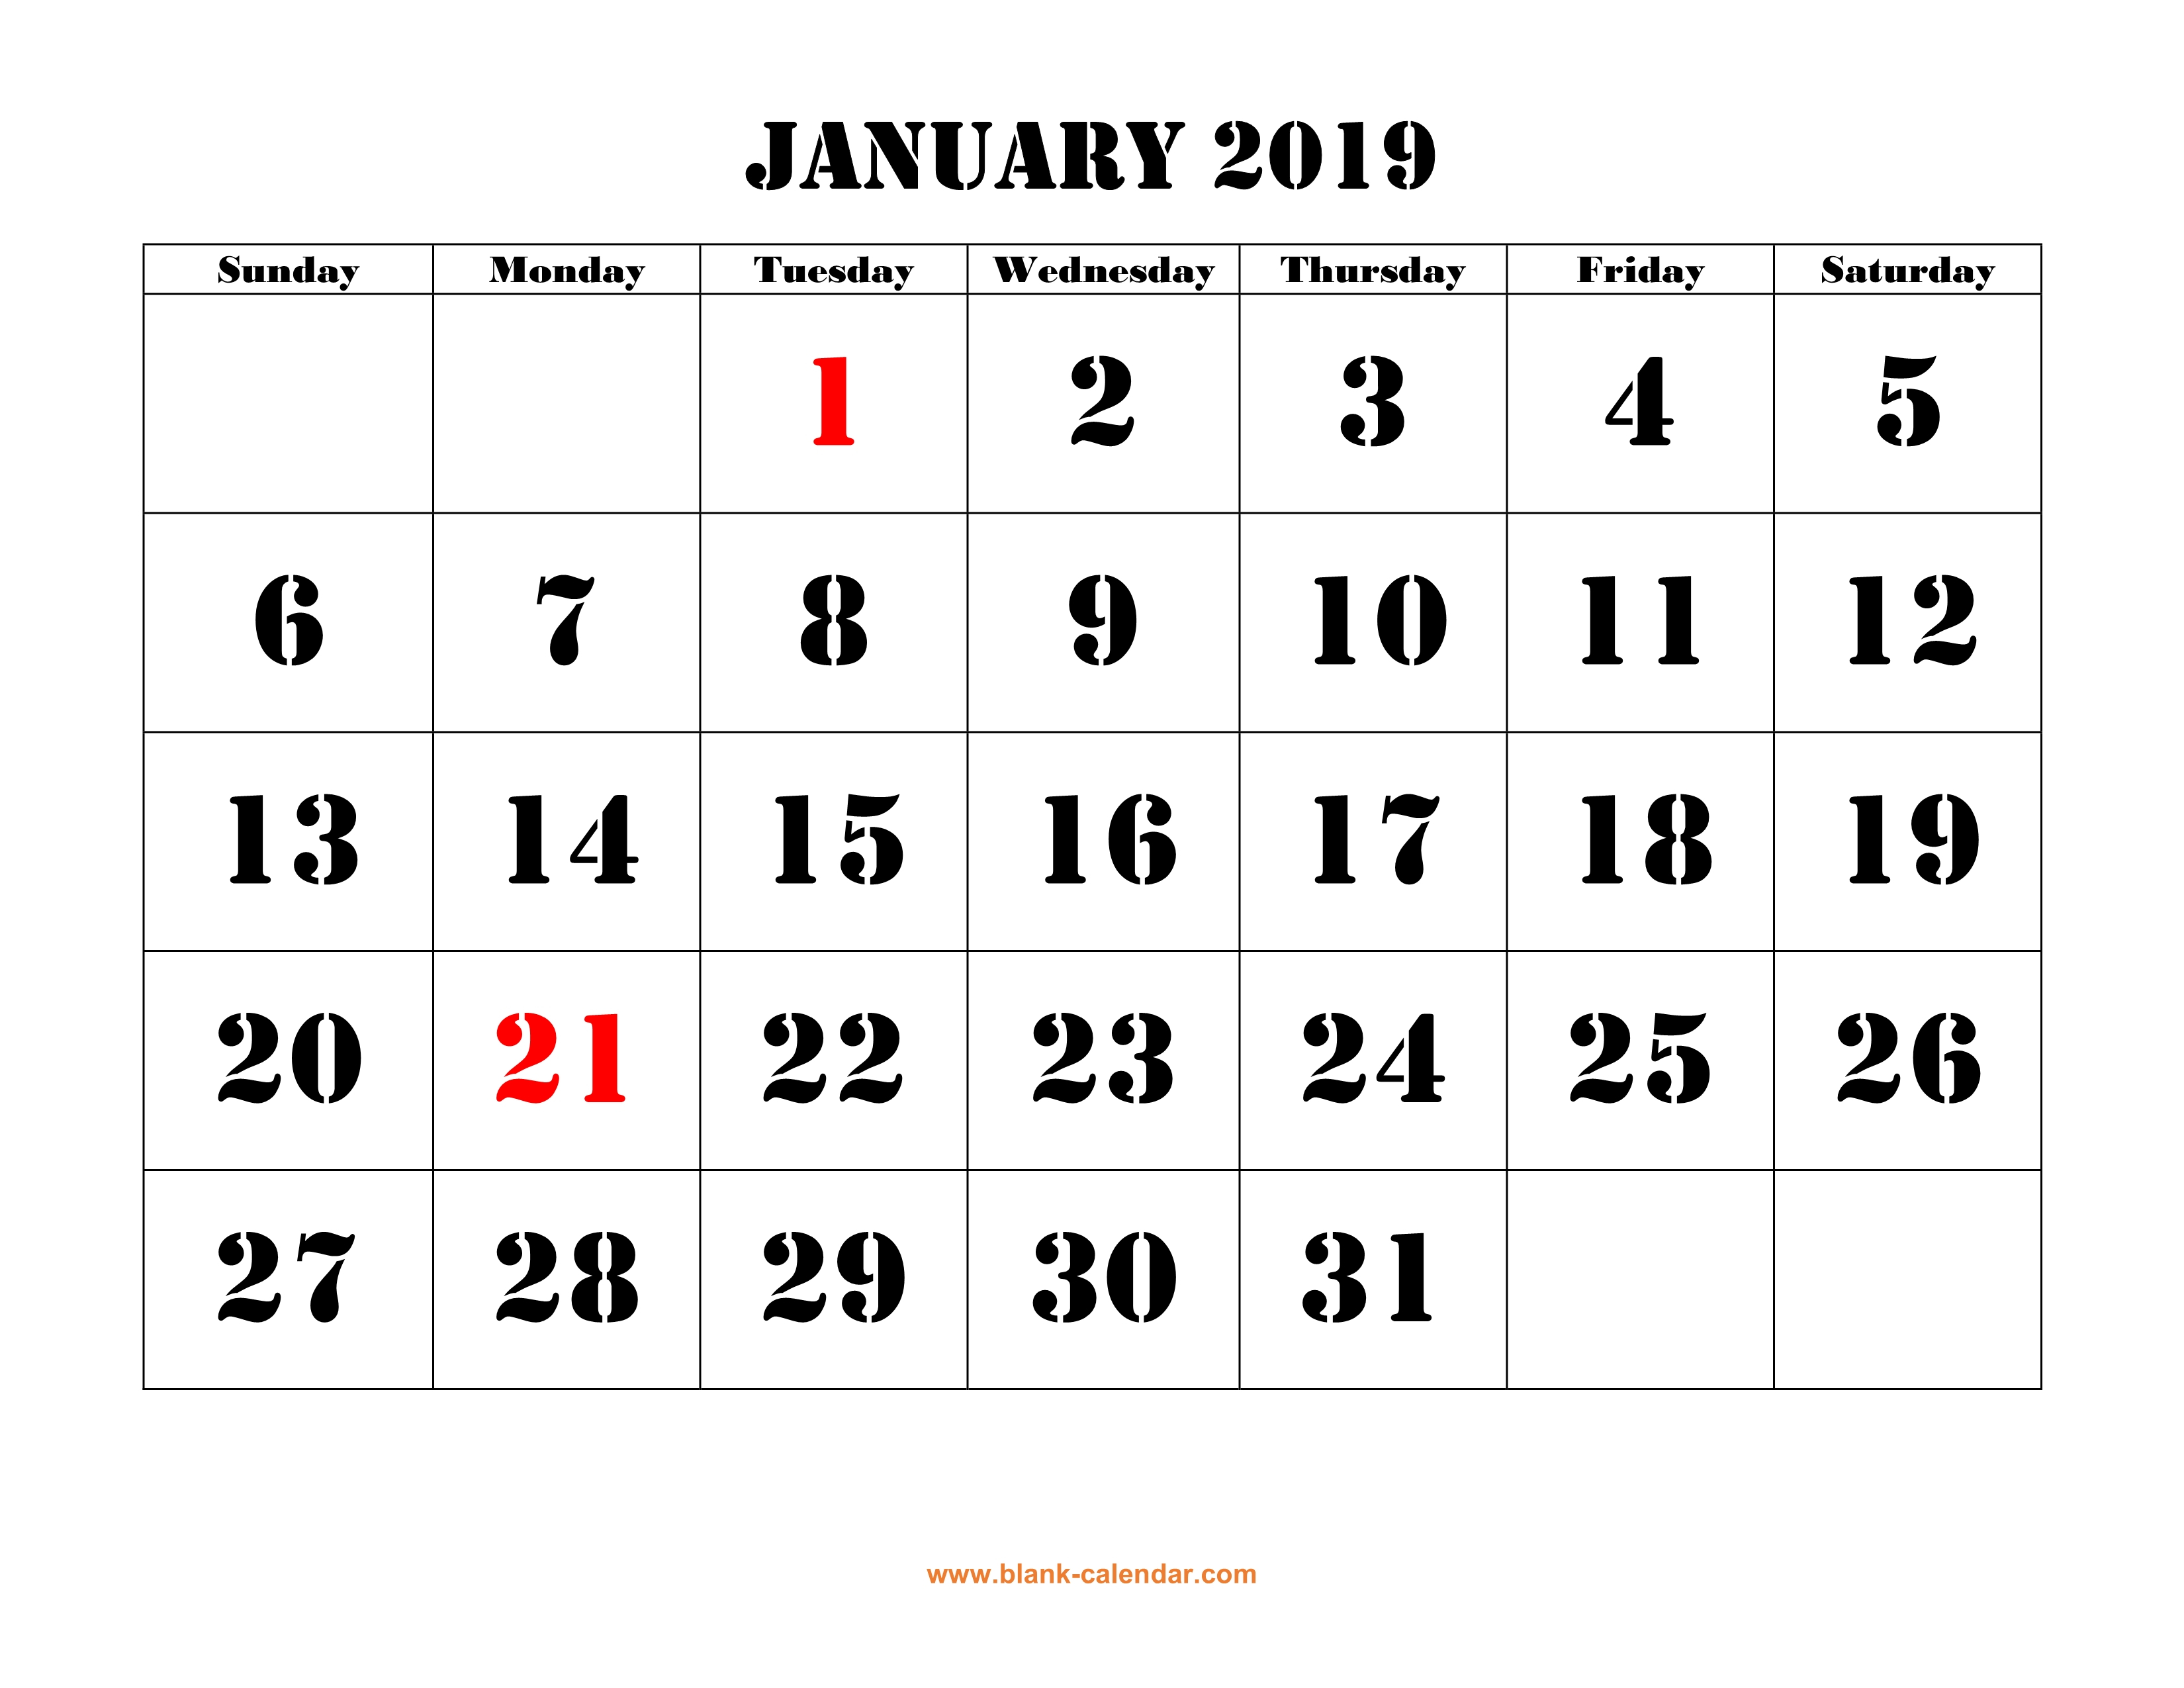 Free Download Printable January 2019 Calendar, Large Font Design throughout Blank Bold December Calendar